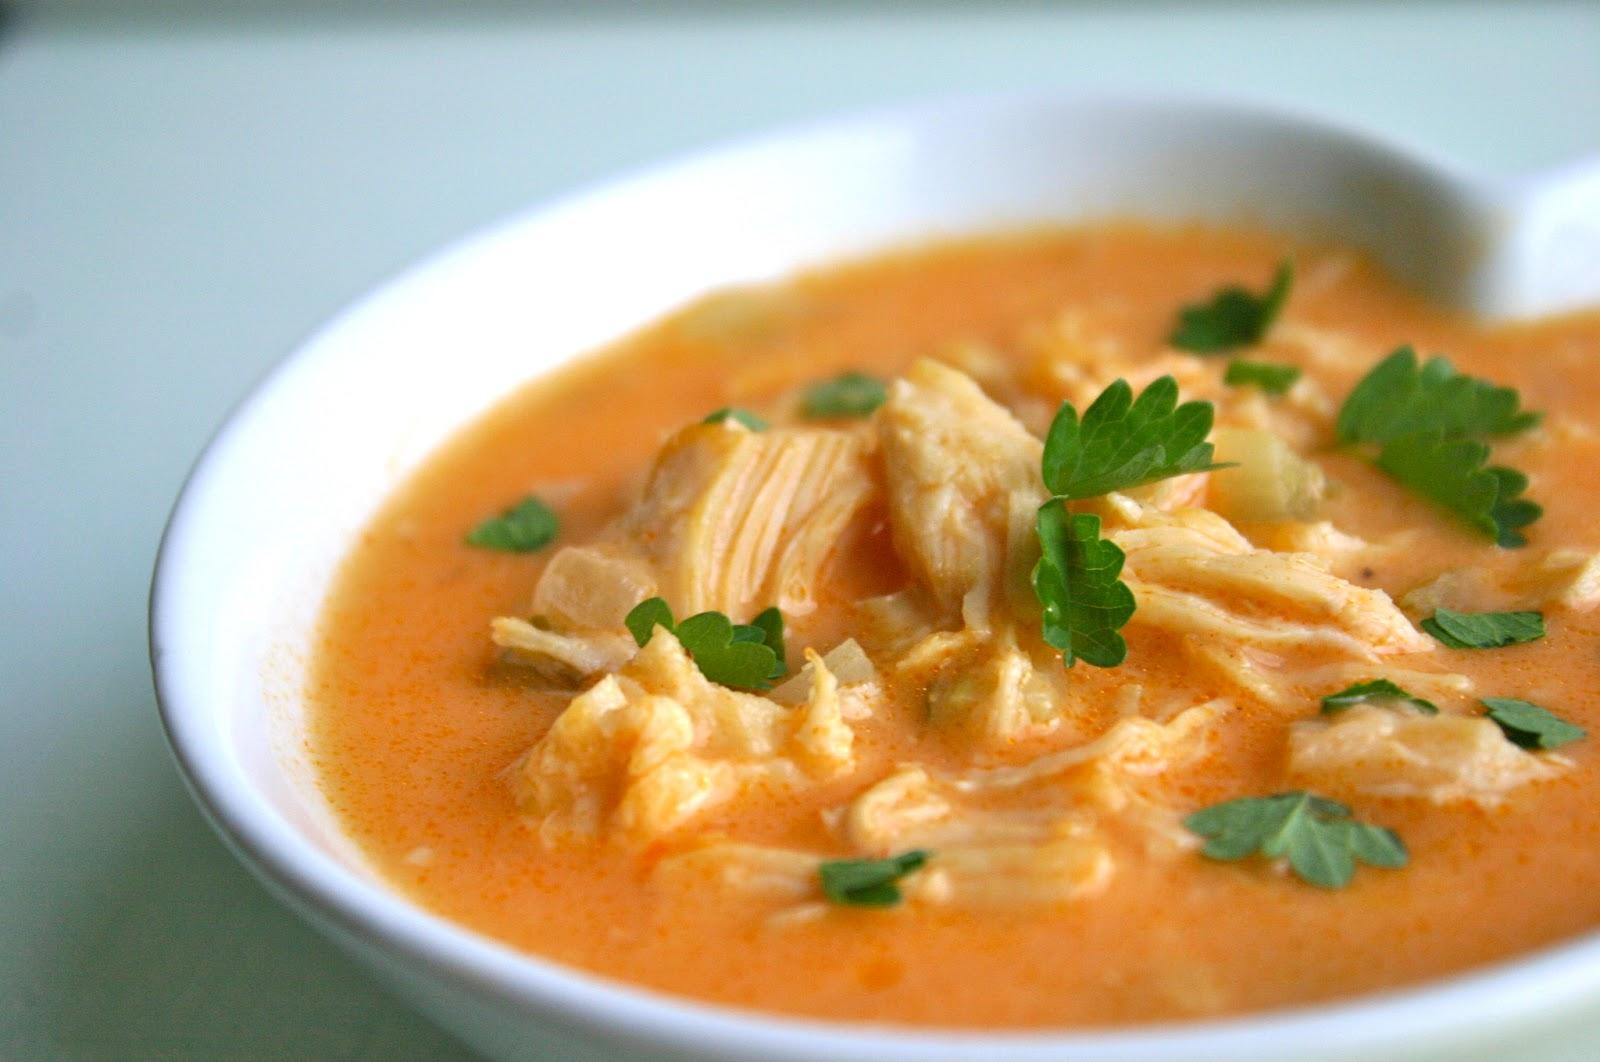 My Retro Kitchen: Buffalo Chicken Soup